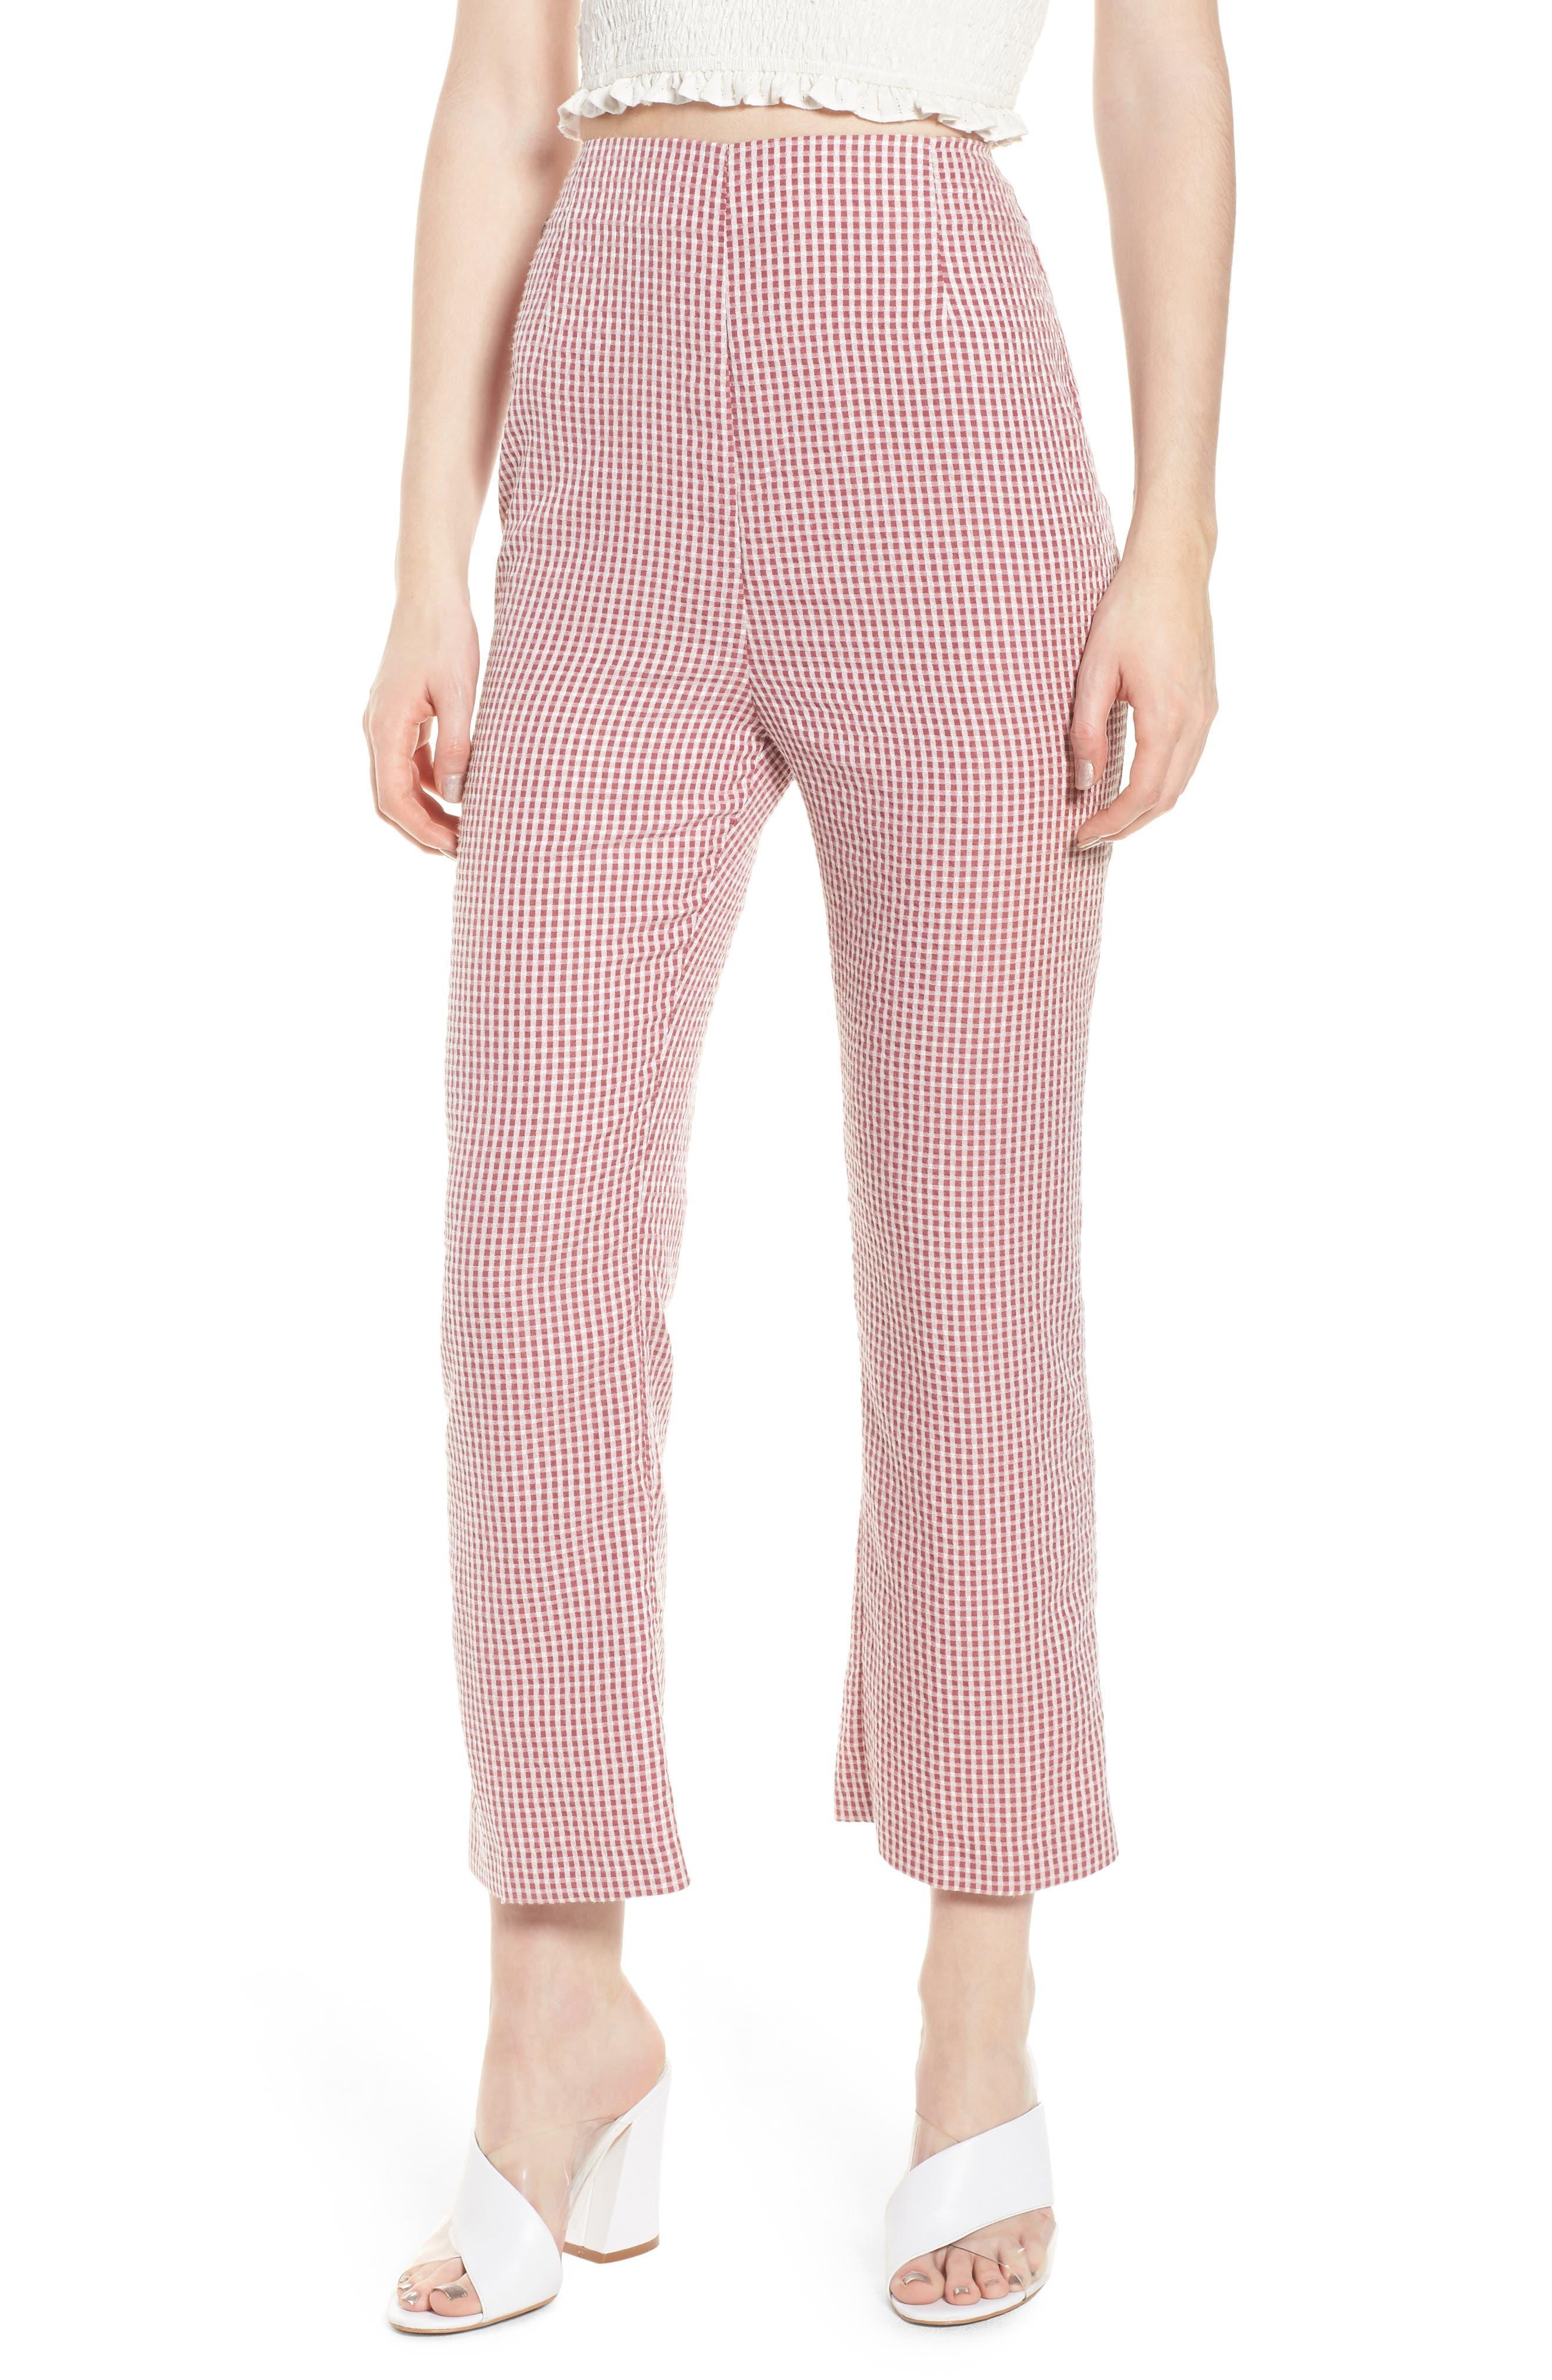 Pisa High Waist Crop Pants,                         Main,                         color, RED GINGHAM